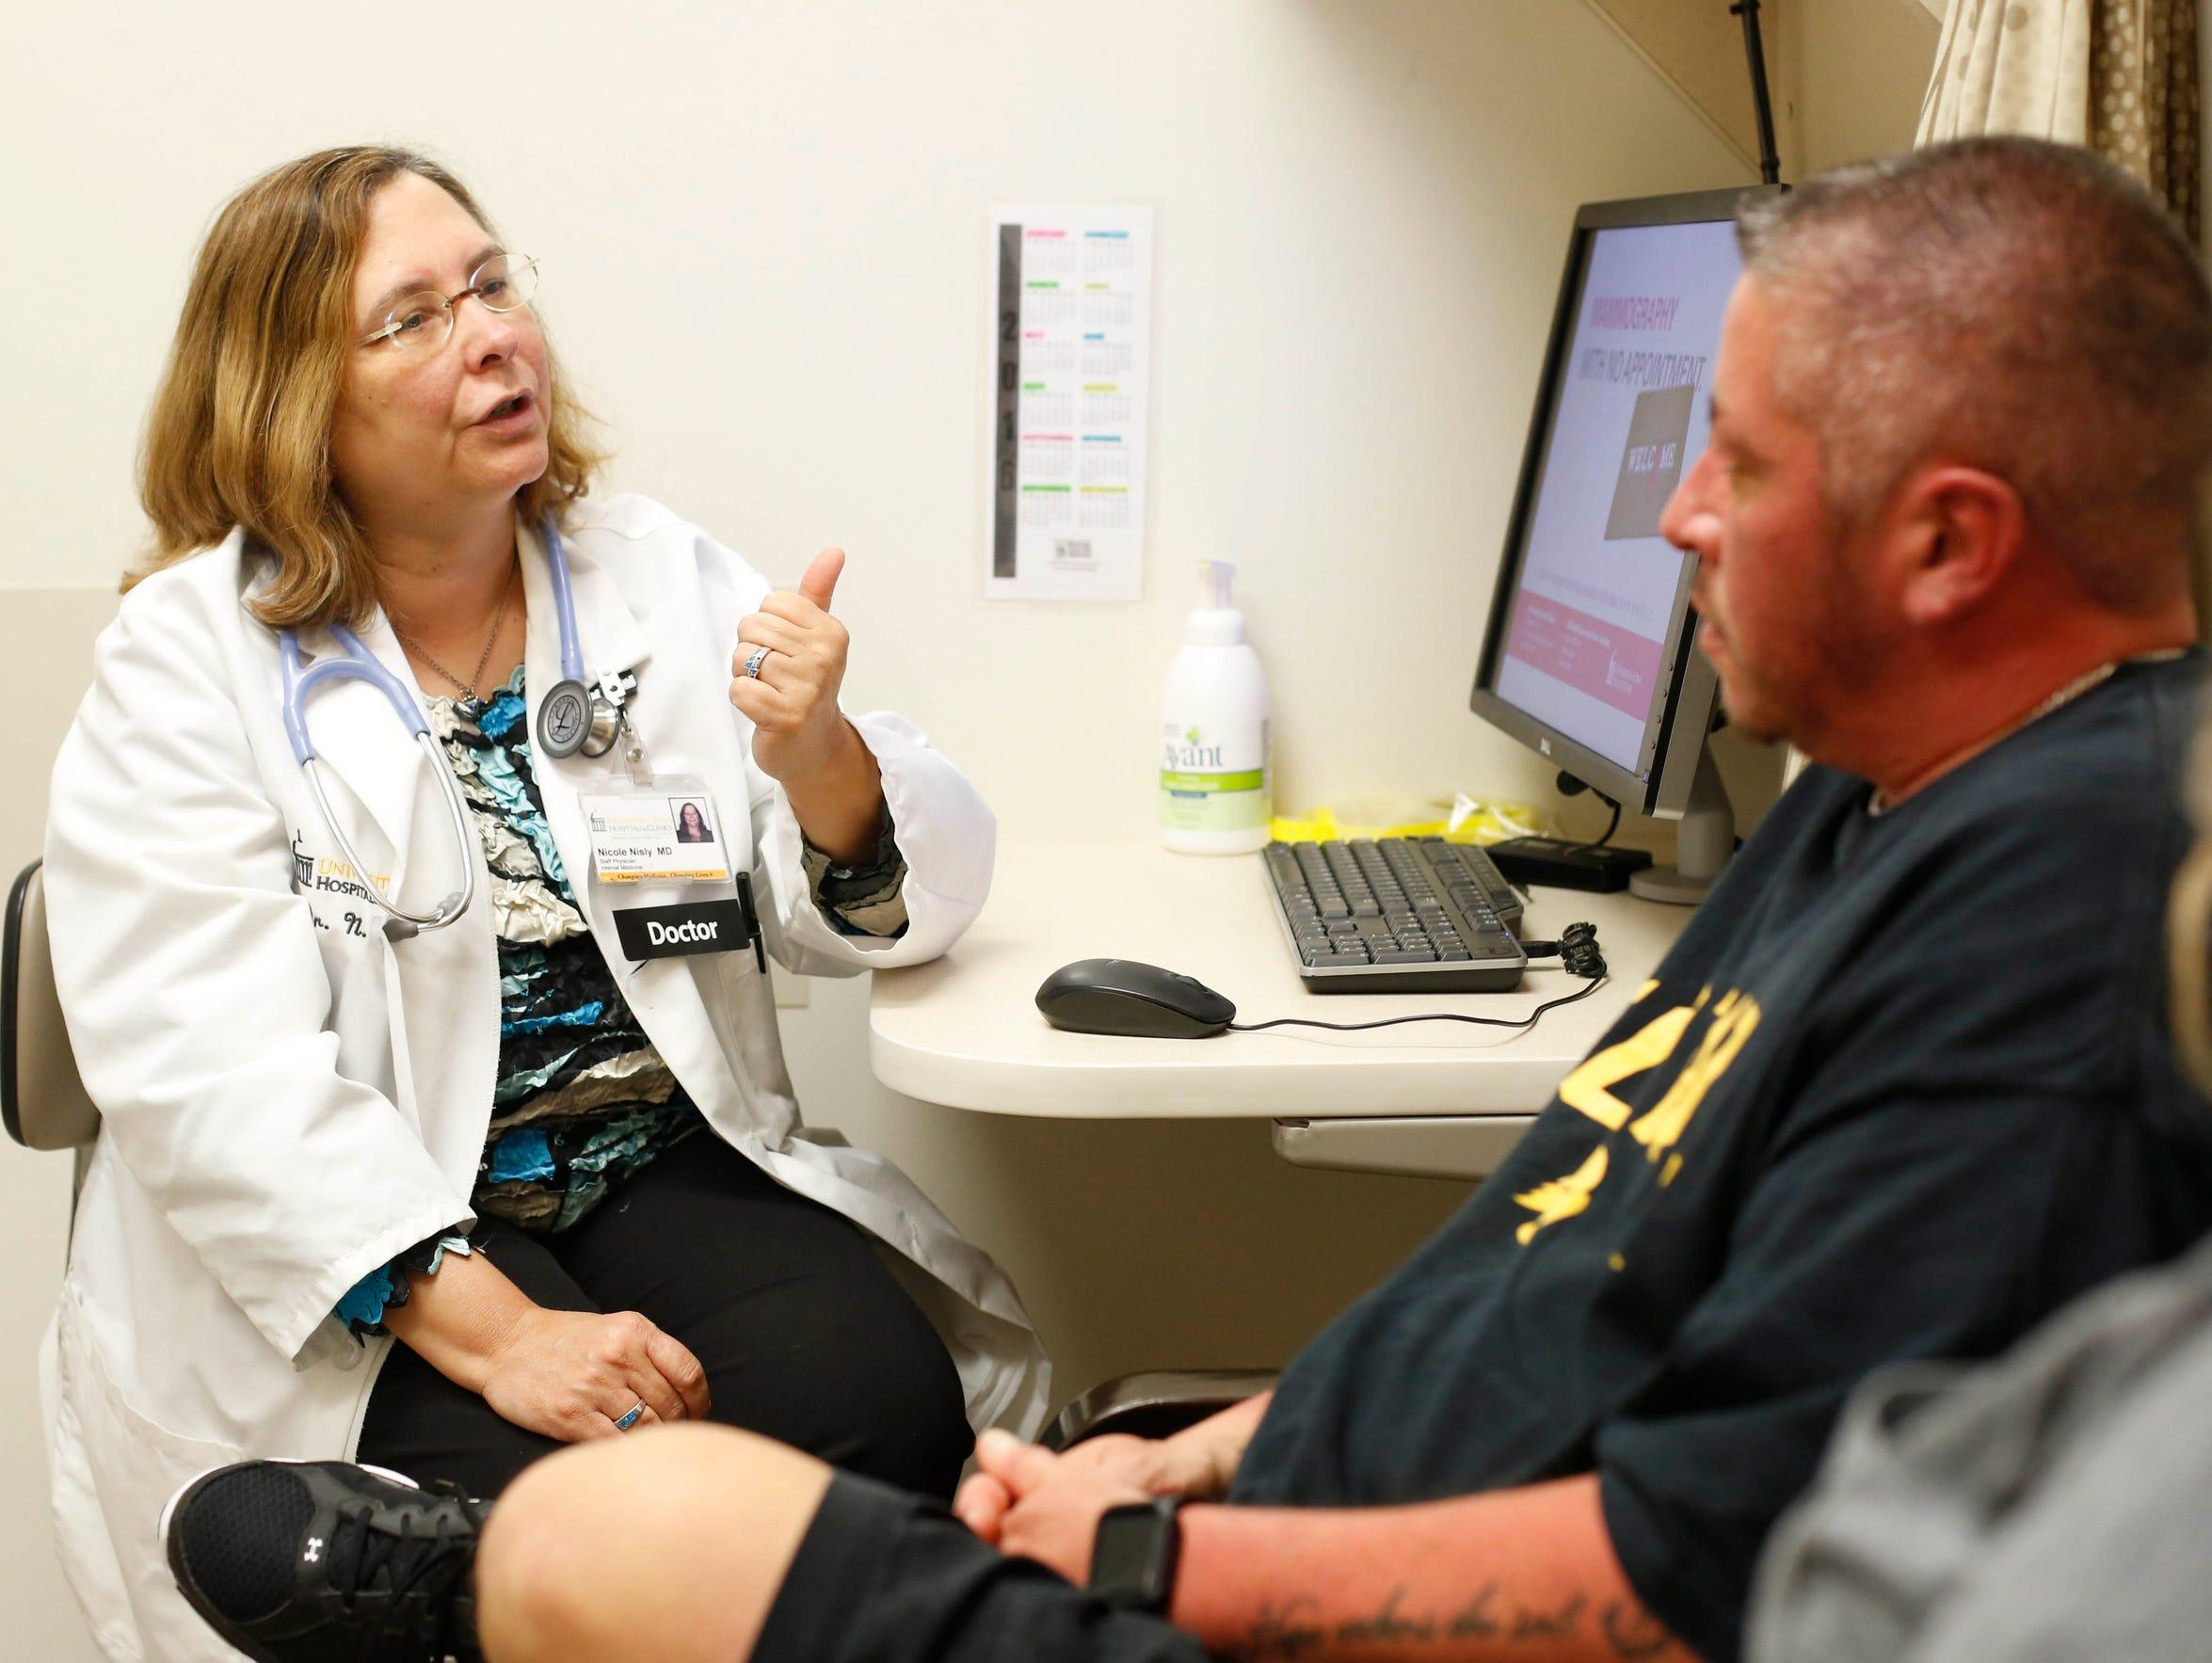 Dr. Nicole Nisly, left, talks with Aiden DeLathower